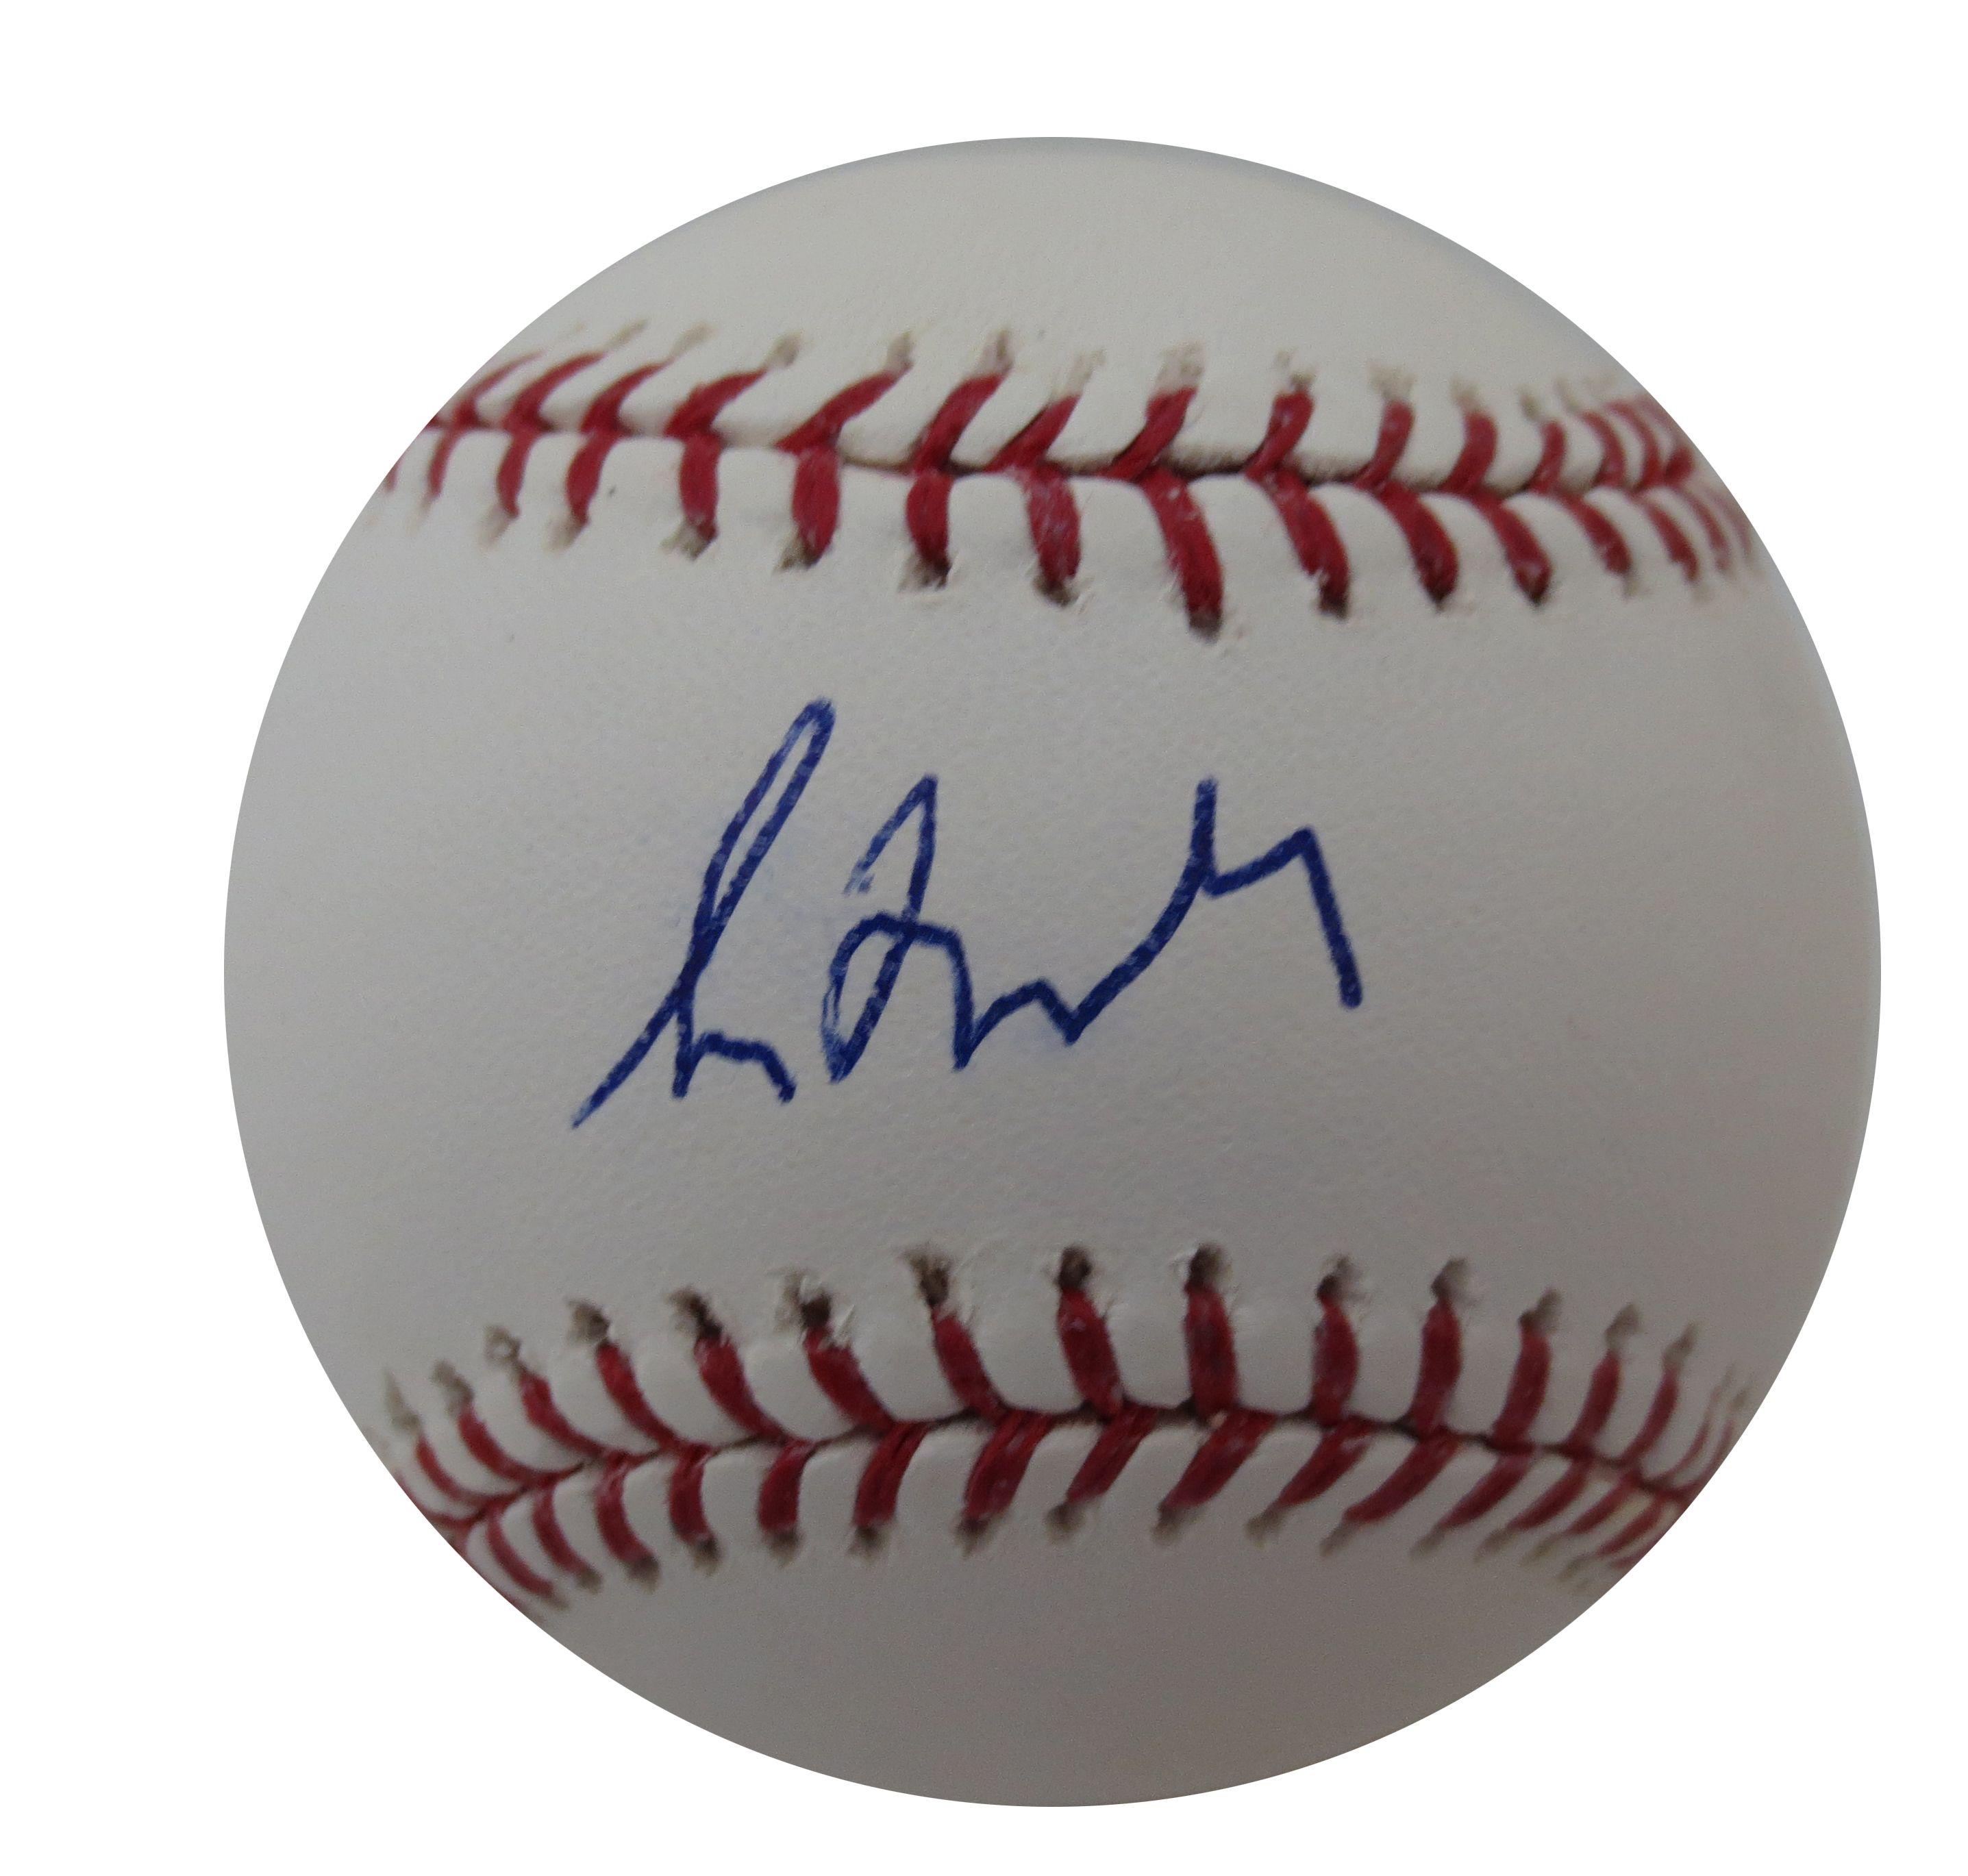 Greg Maddux Signed Mlb Baseball From Powers Autographs 99 95 Http Www Powersautographs Com Greg Maddux Autographed Mlb Signed Greg Maddux Mlb Baseball Mlb